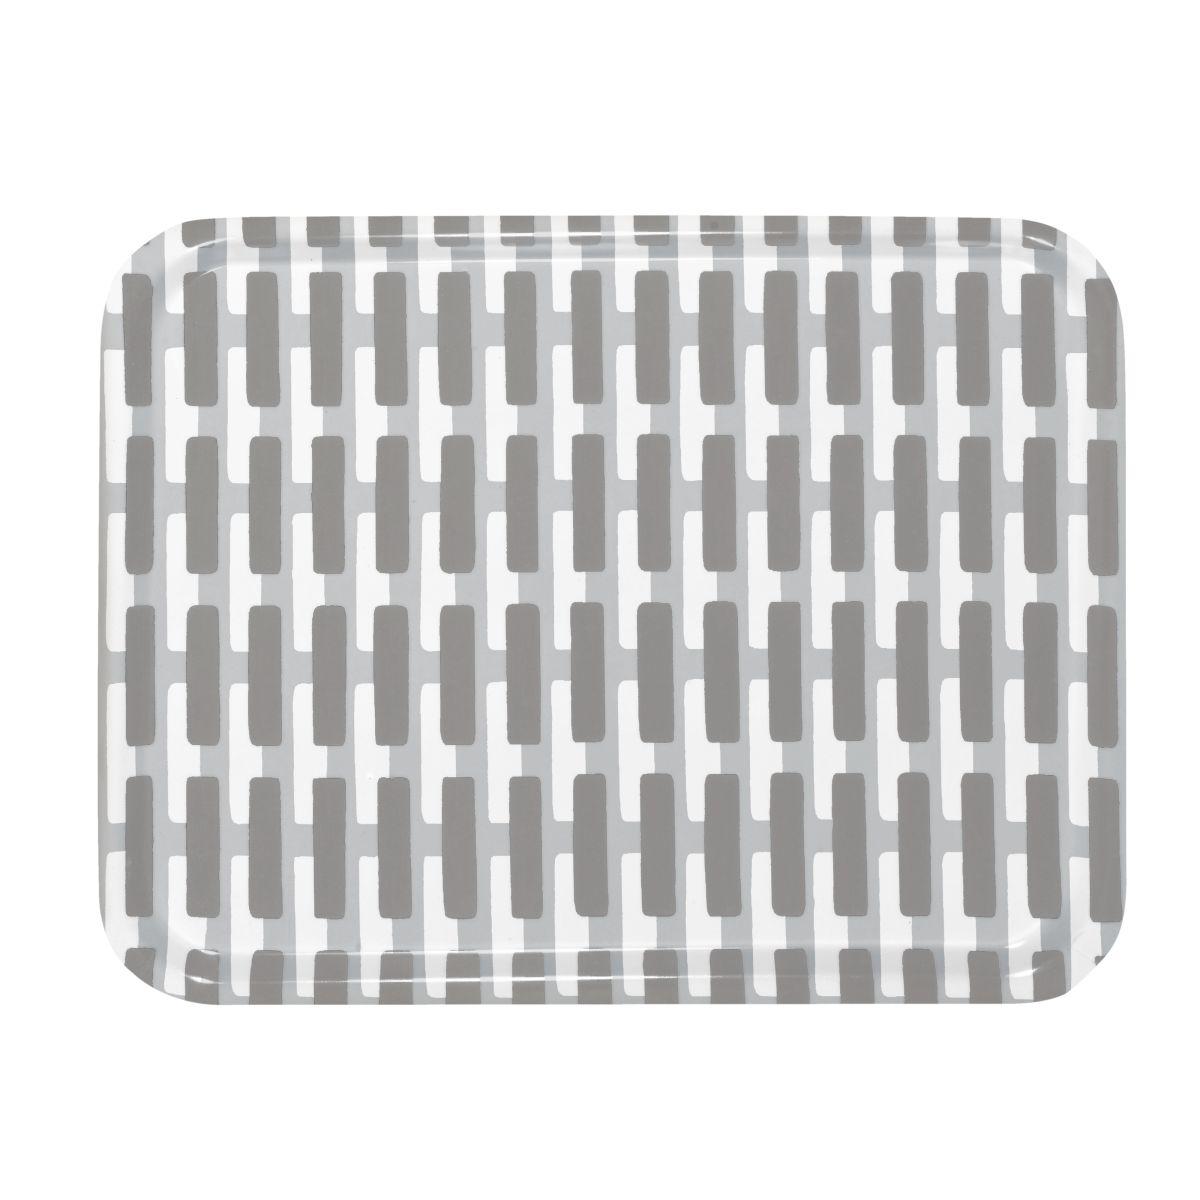 Siena-Tray-large-grey-light-grey-shadow-3976930